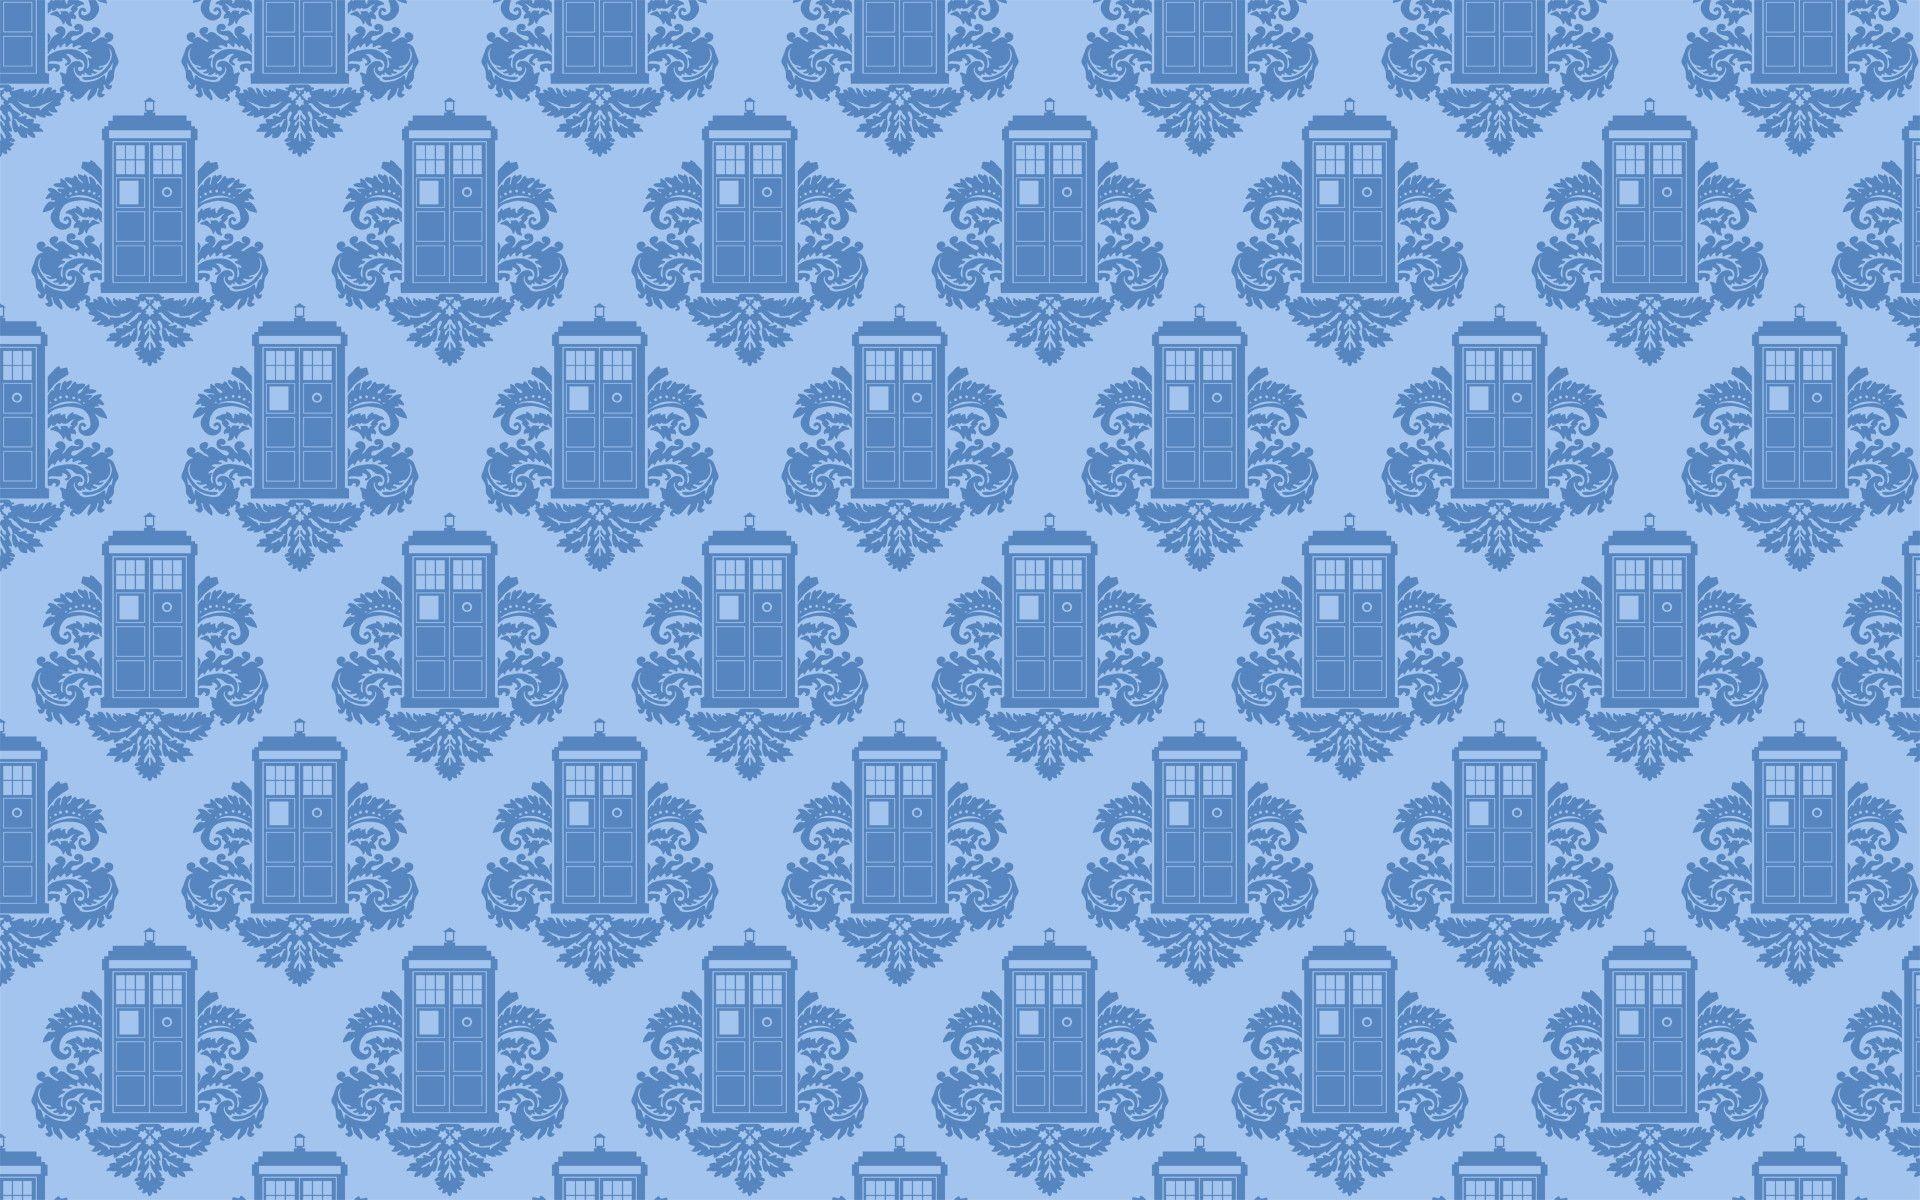 Doctor Who Tardis wallpaper – 881387